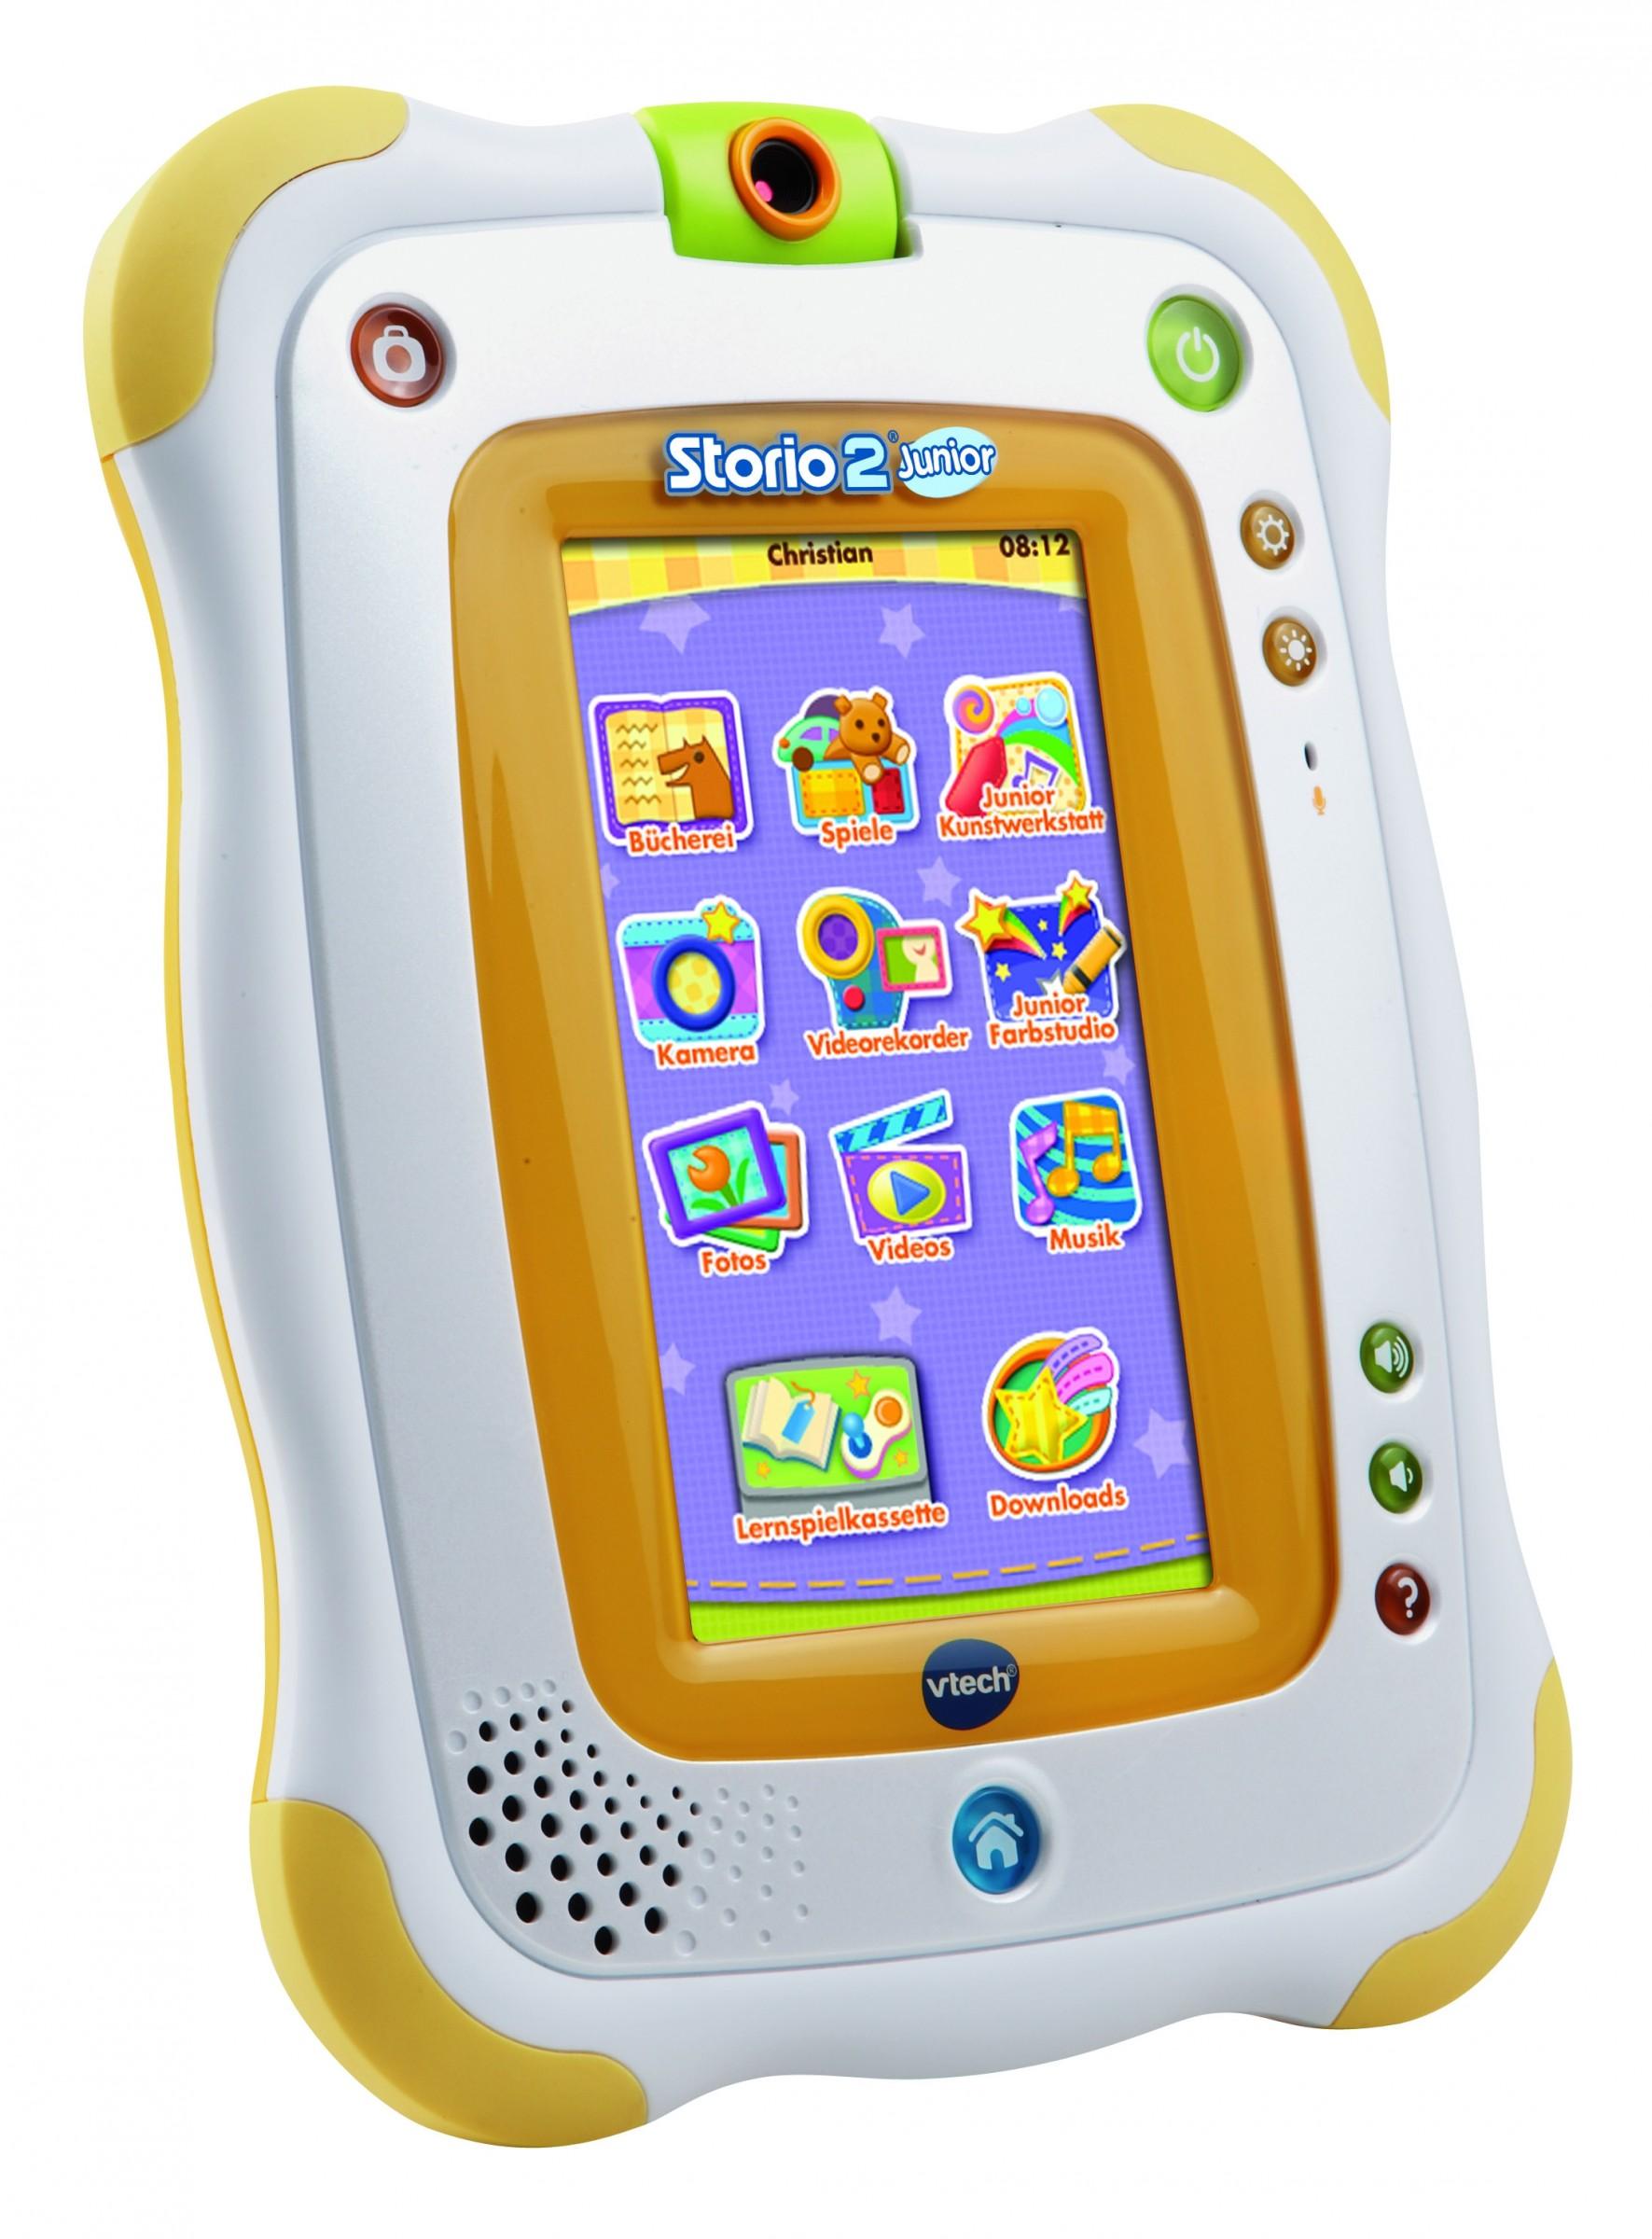 VTech Storio 2 Junior